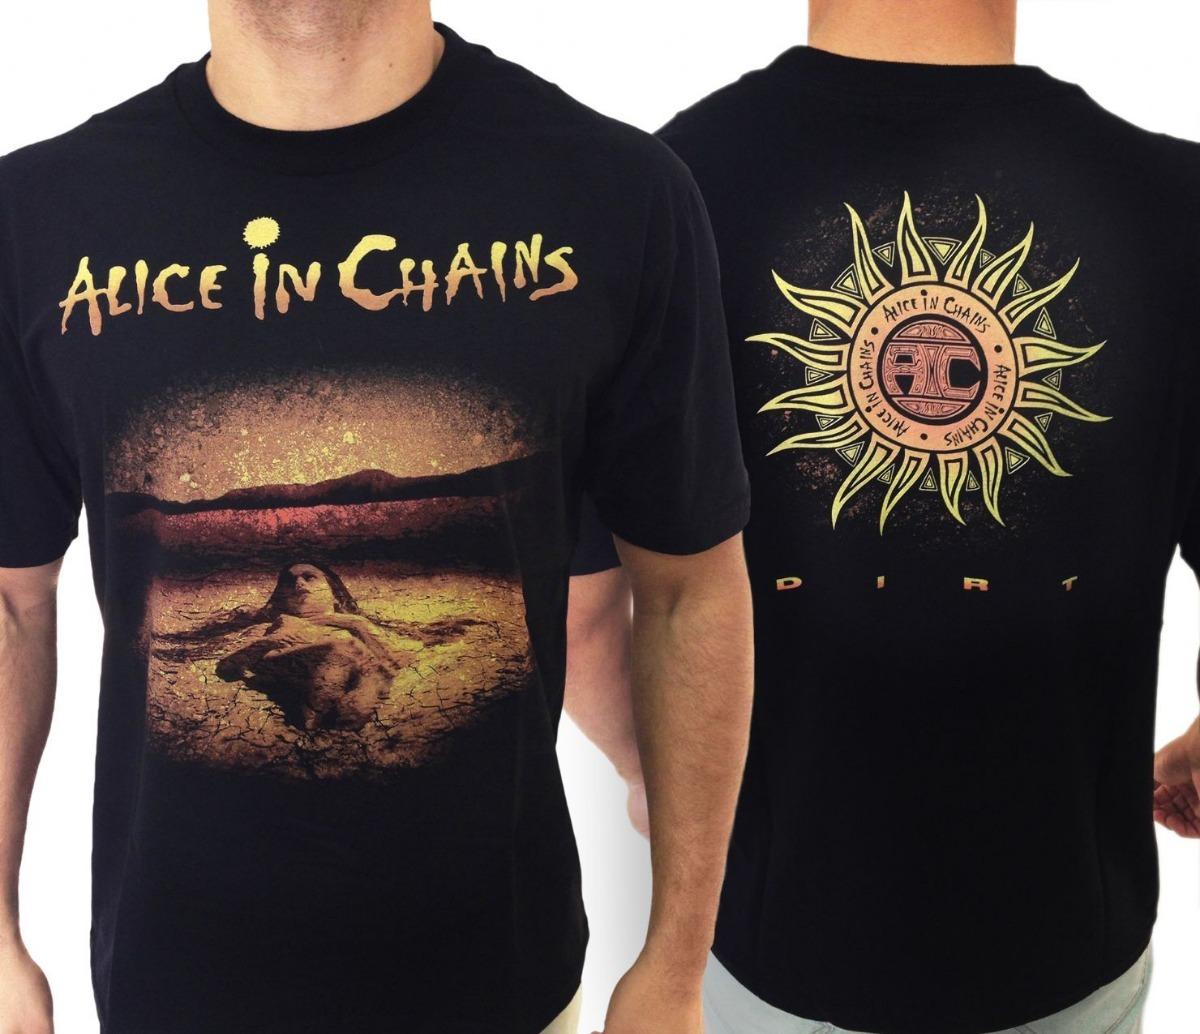 681c575955 camiseta banda alice in chains - dirt - consulado rock xxg. Carregando zoom.